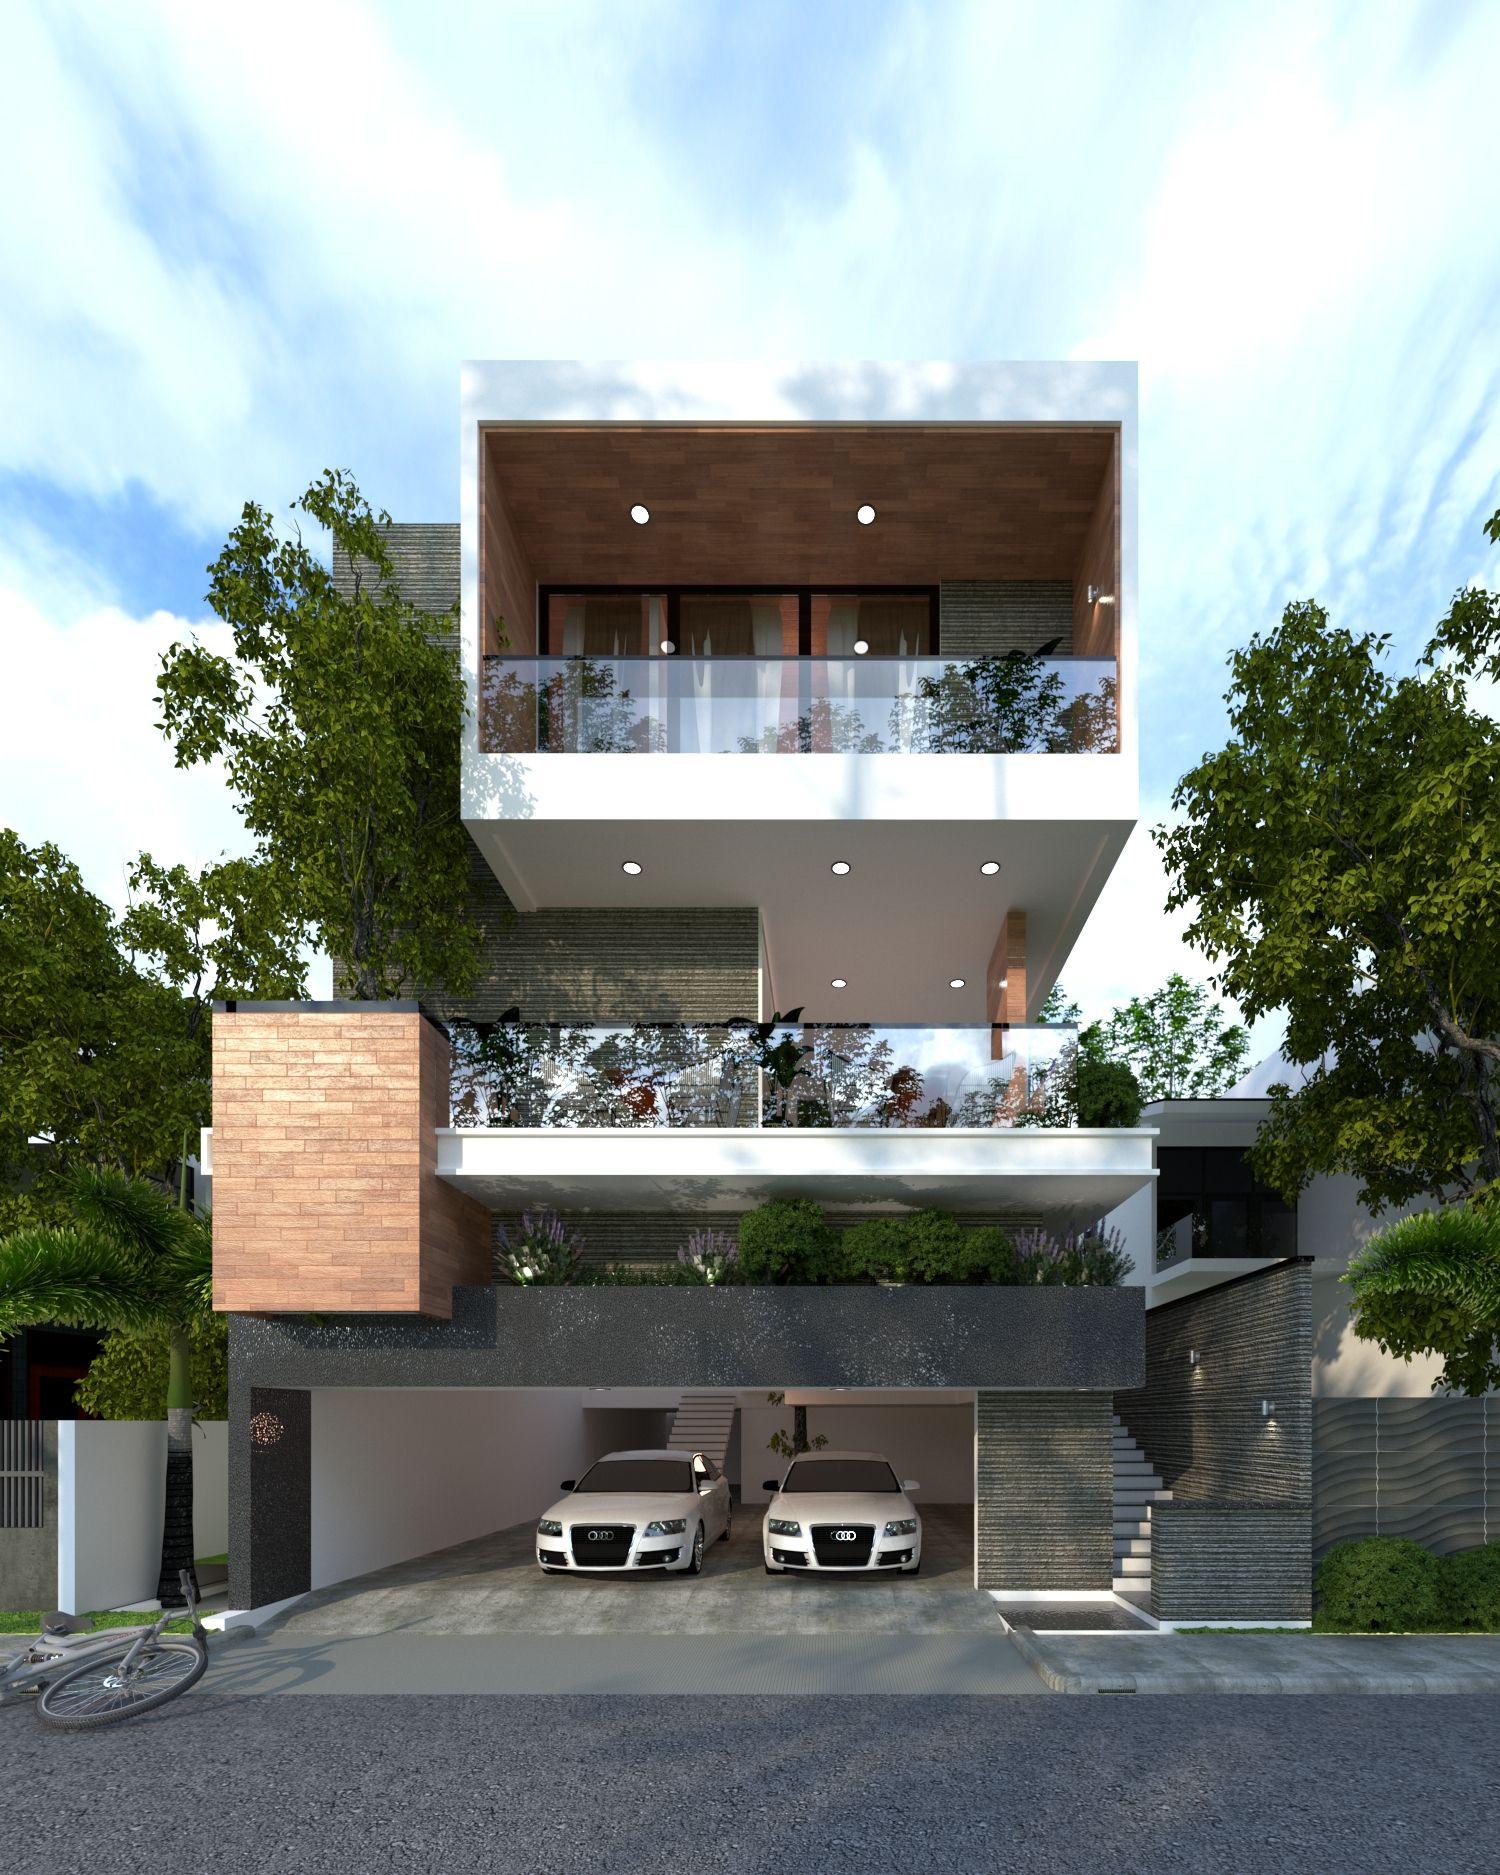 Villa buy EM. Home 0332556777 0964135375 trong 2019